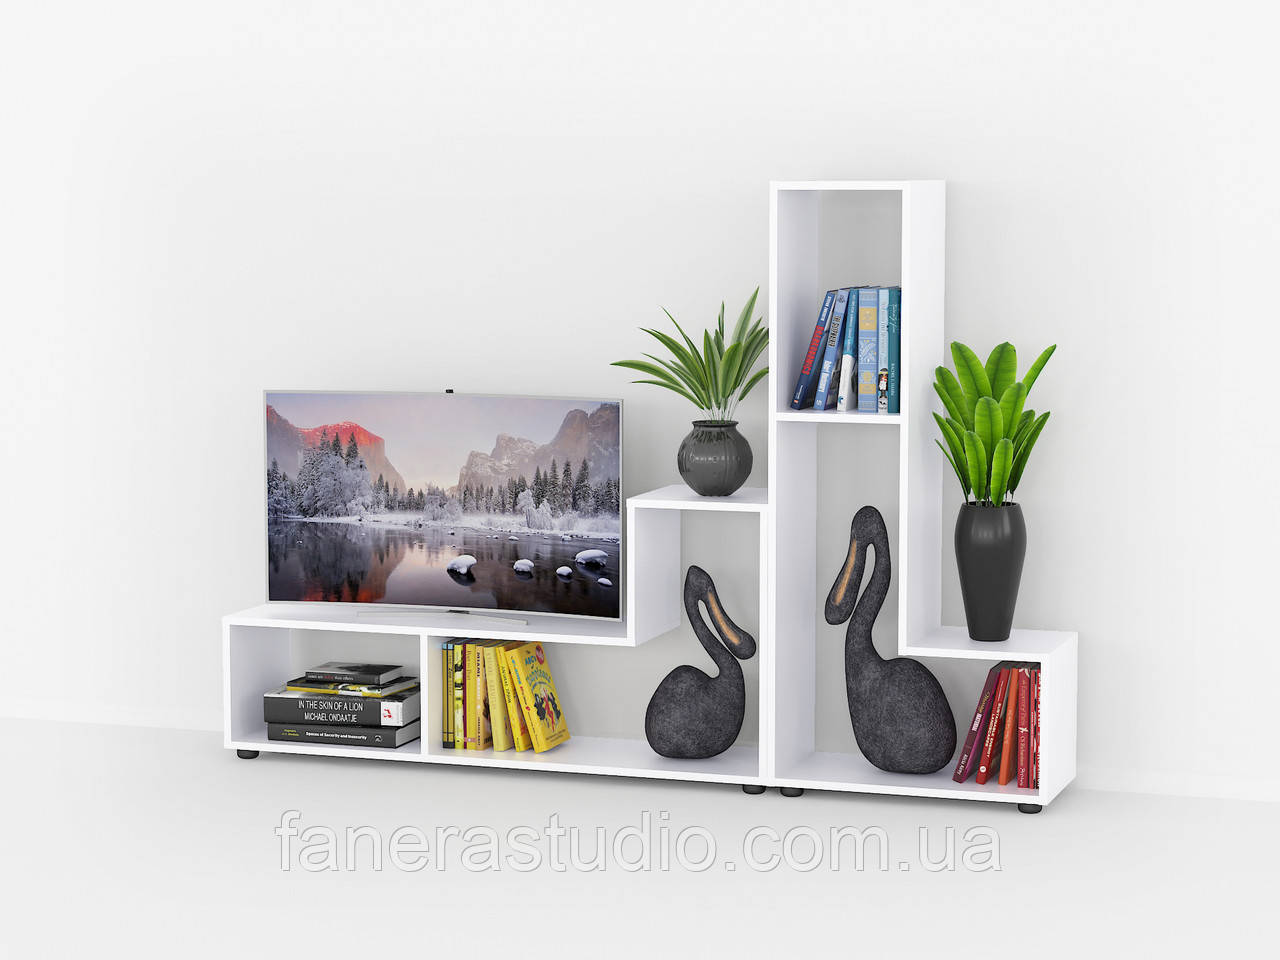 Комплект полиць міні 2 штуки, полки для книг, тумби под ТВ из ДСП